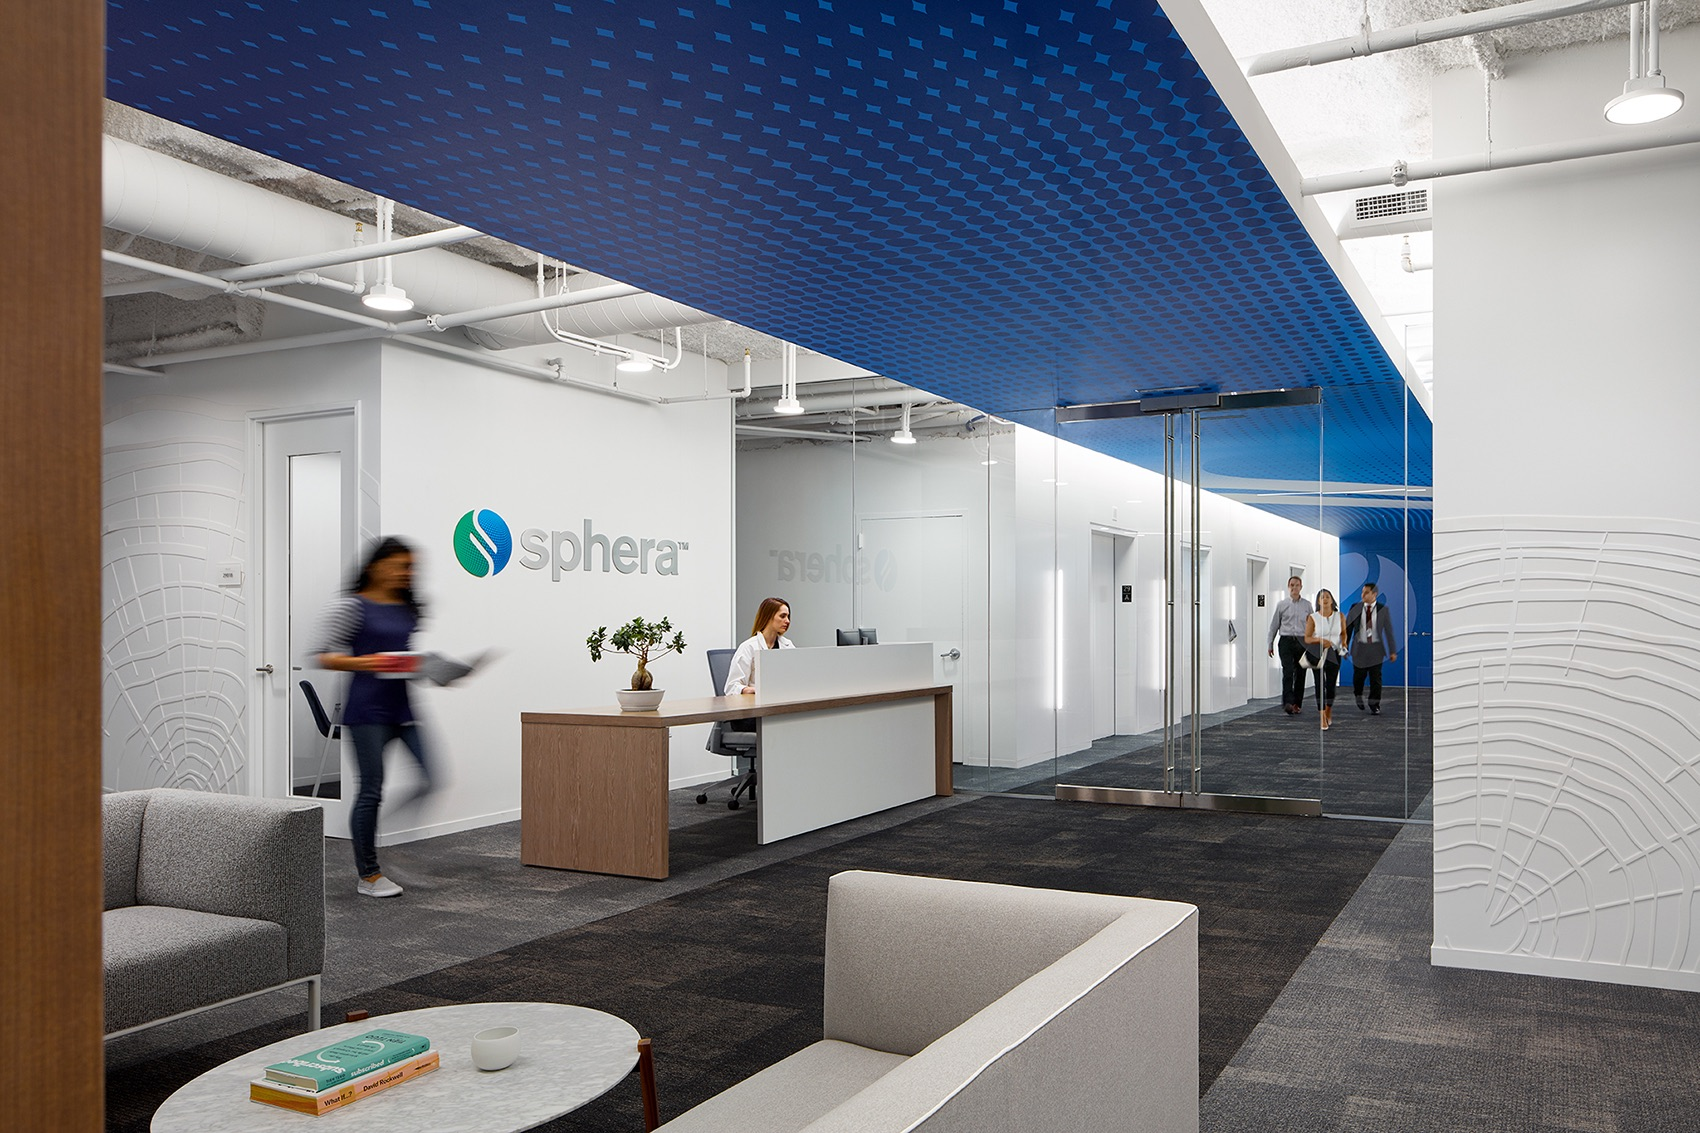 sphera-office-chicago-3